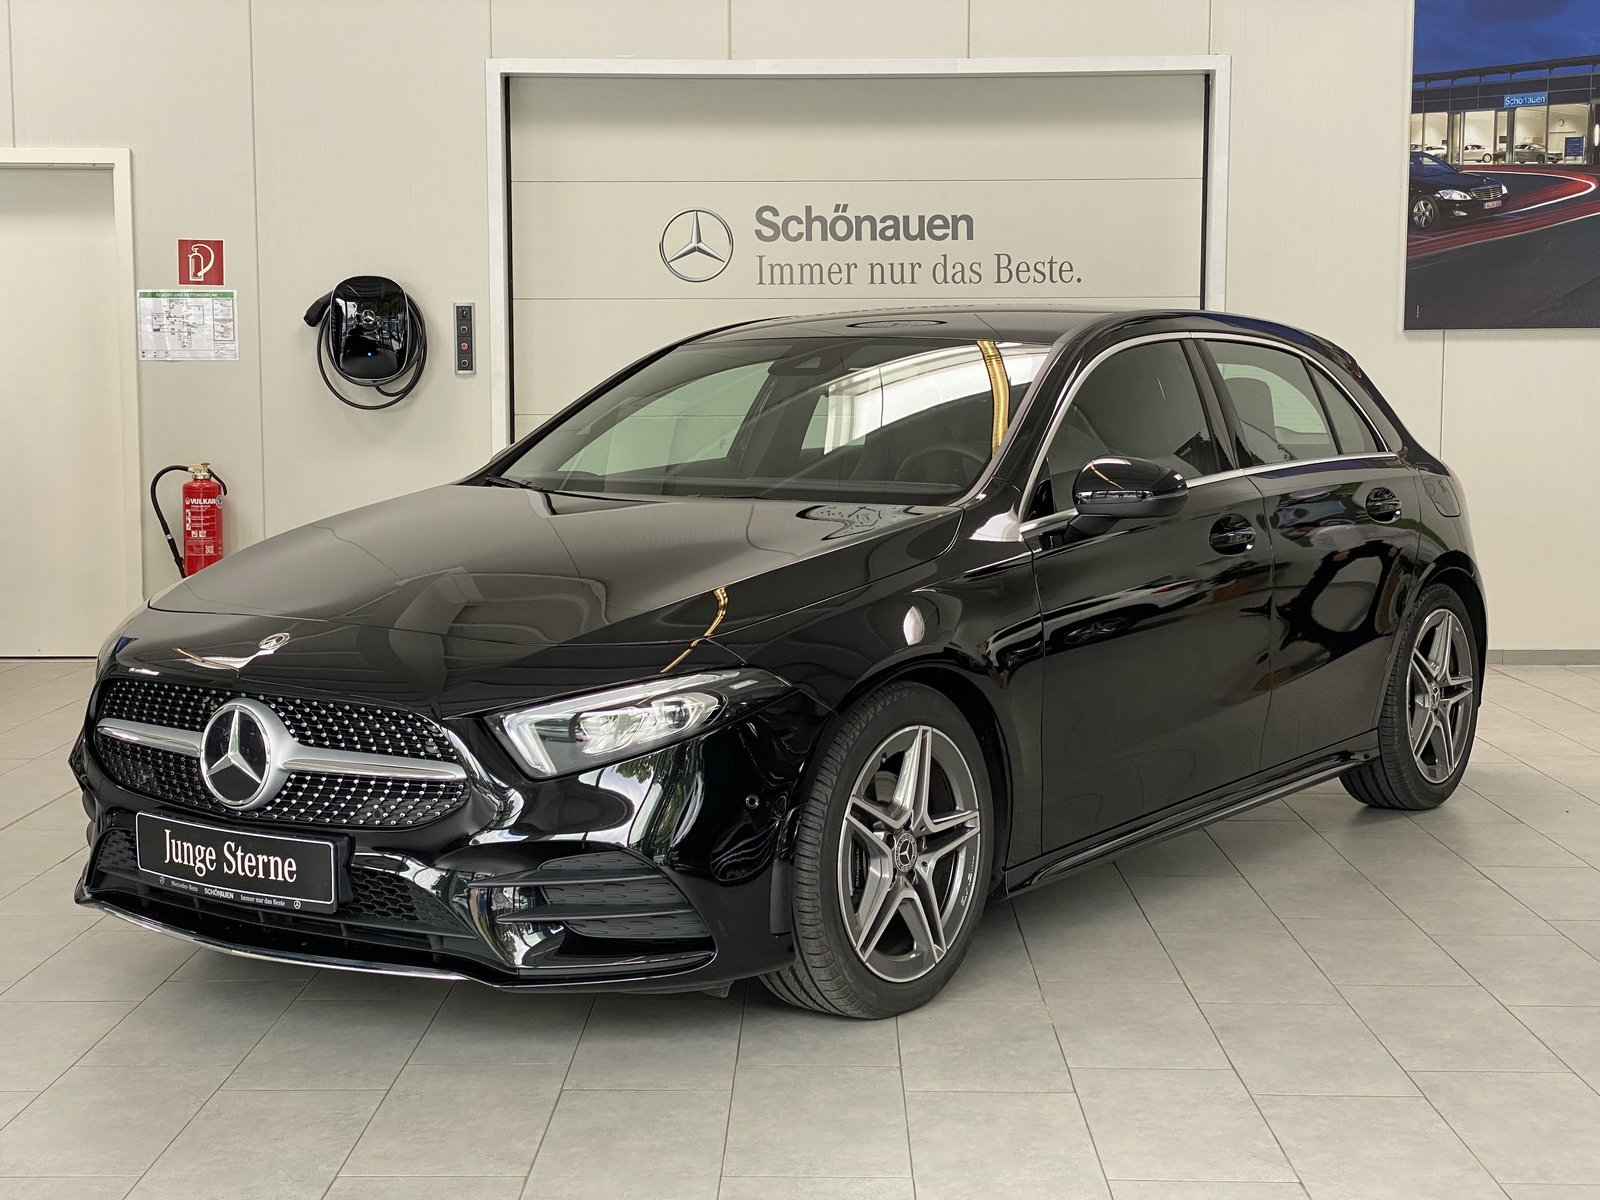 Mercedes-Benz A 200d AMG+KAMERA+MBUX+LED+NAVI PREMIUM+SPURASS., Jahr 2020, Diesel